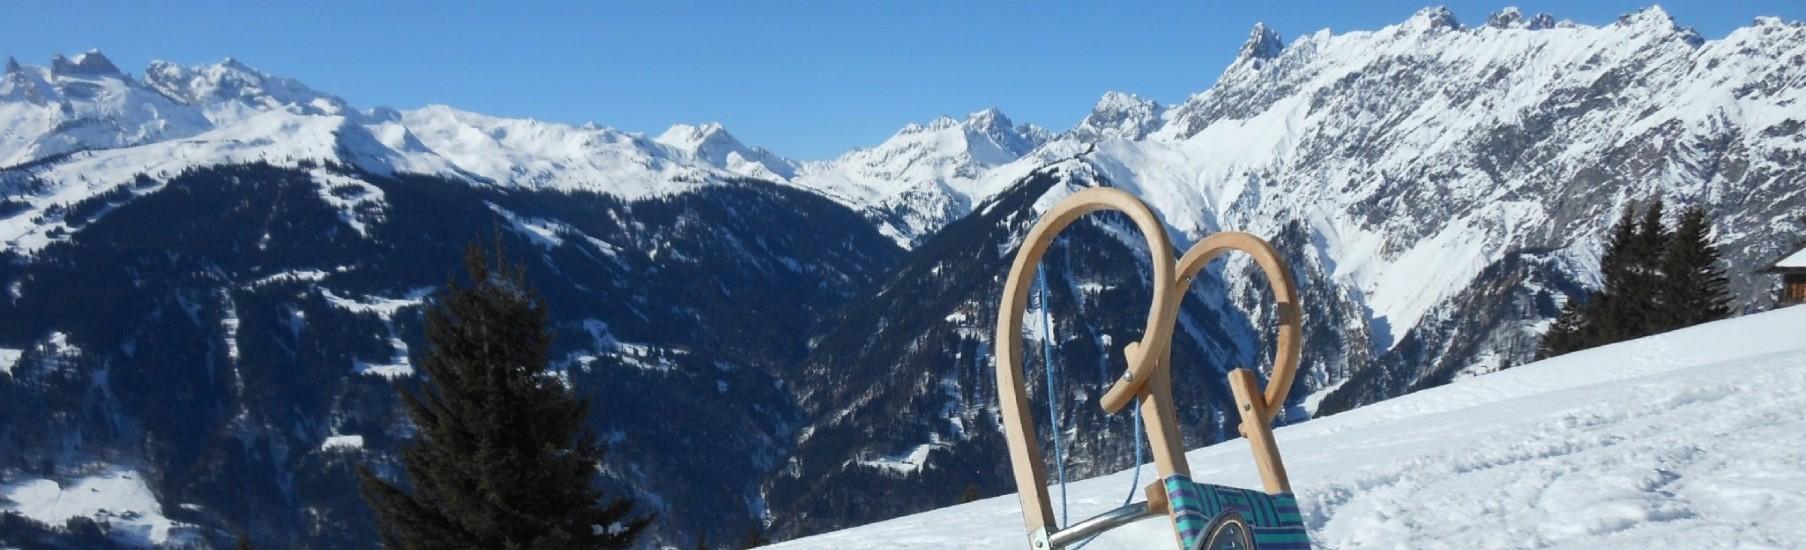 hotel-bergerhof-winterurlaub-montafon-4-s